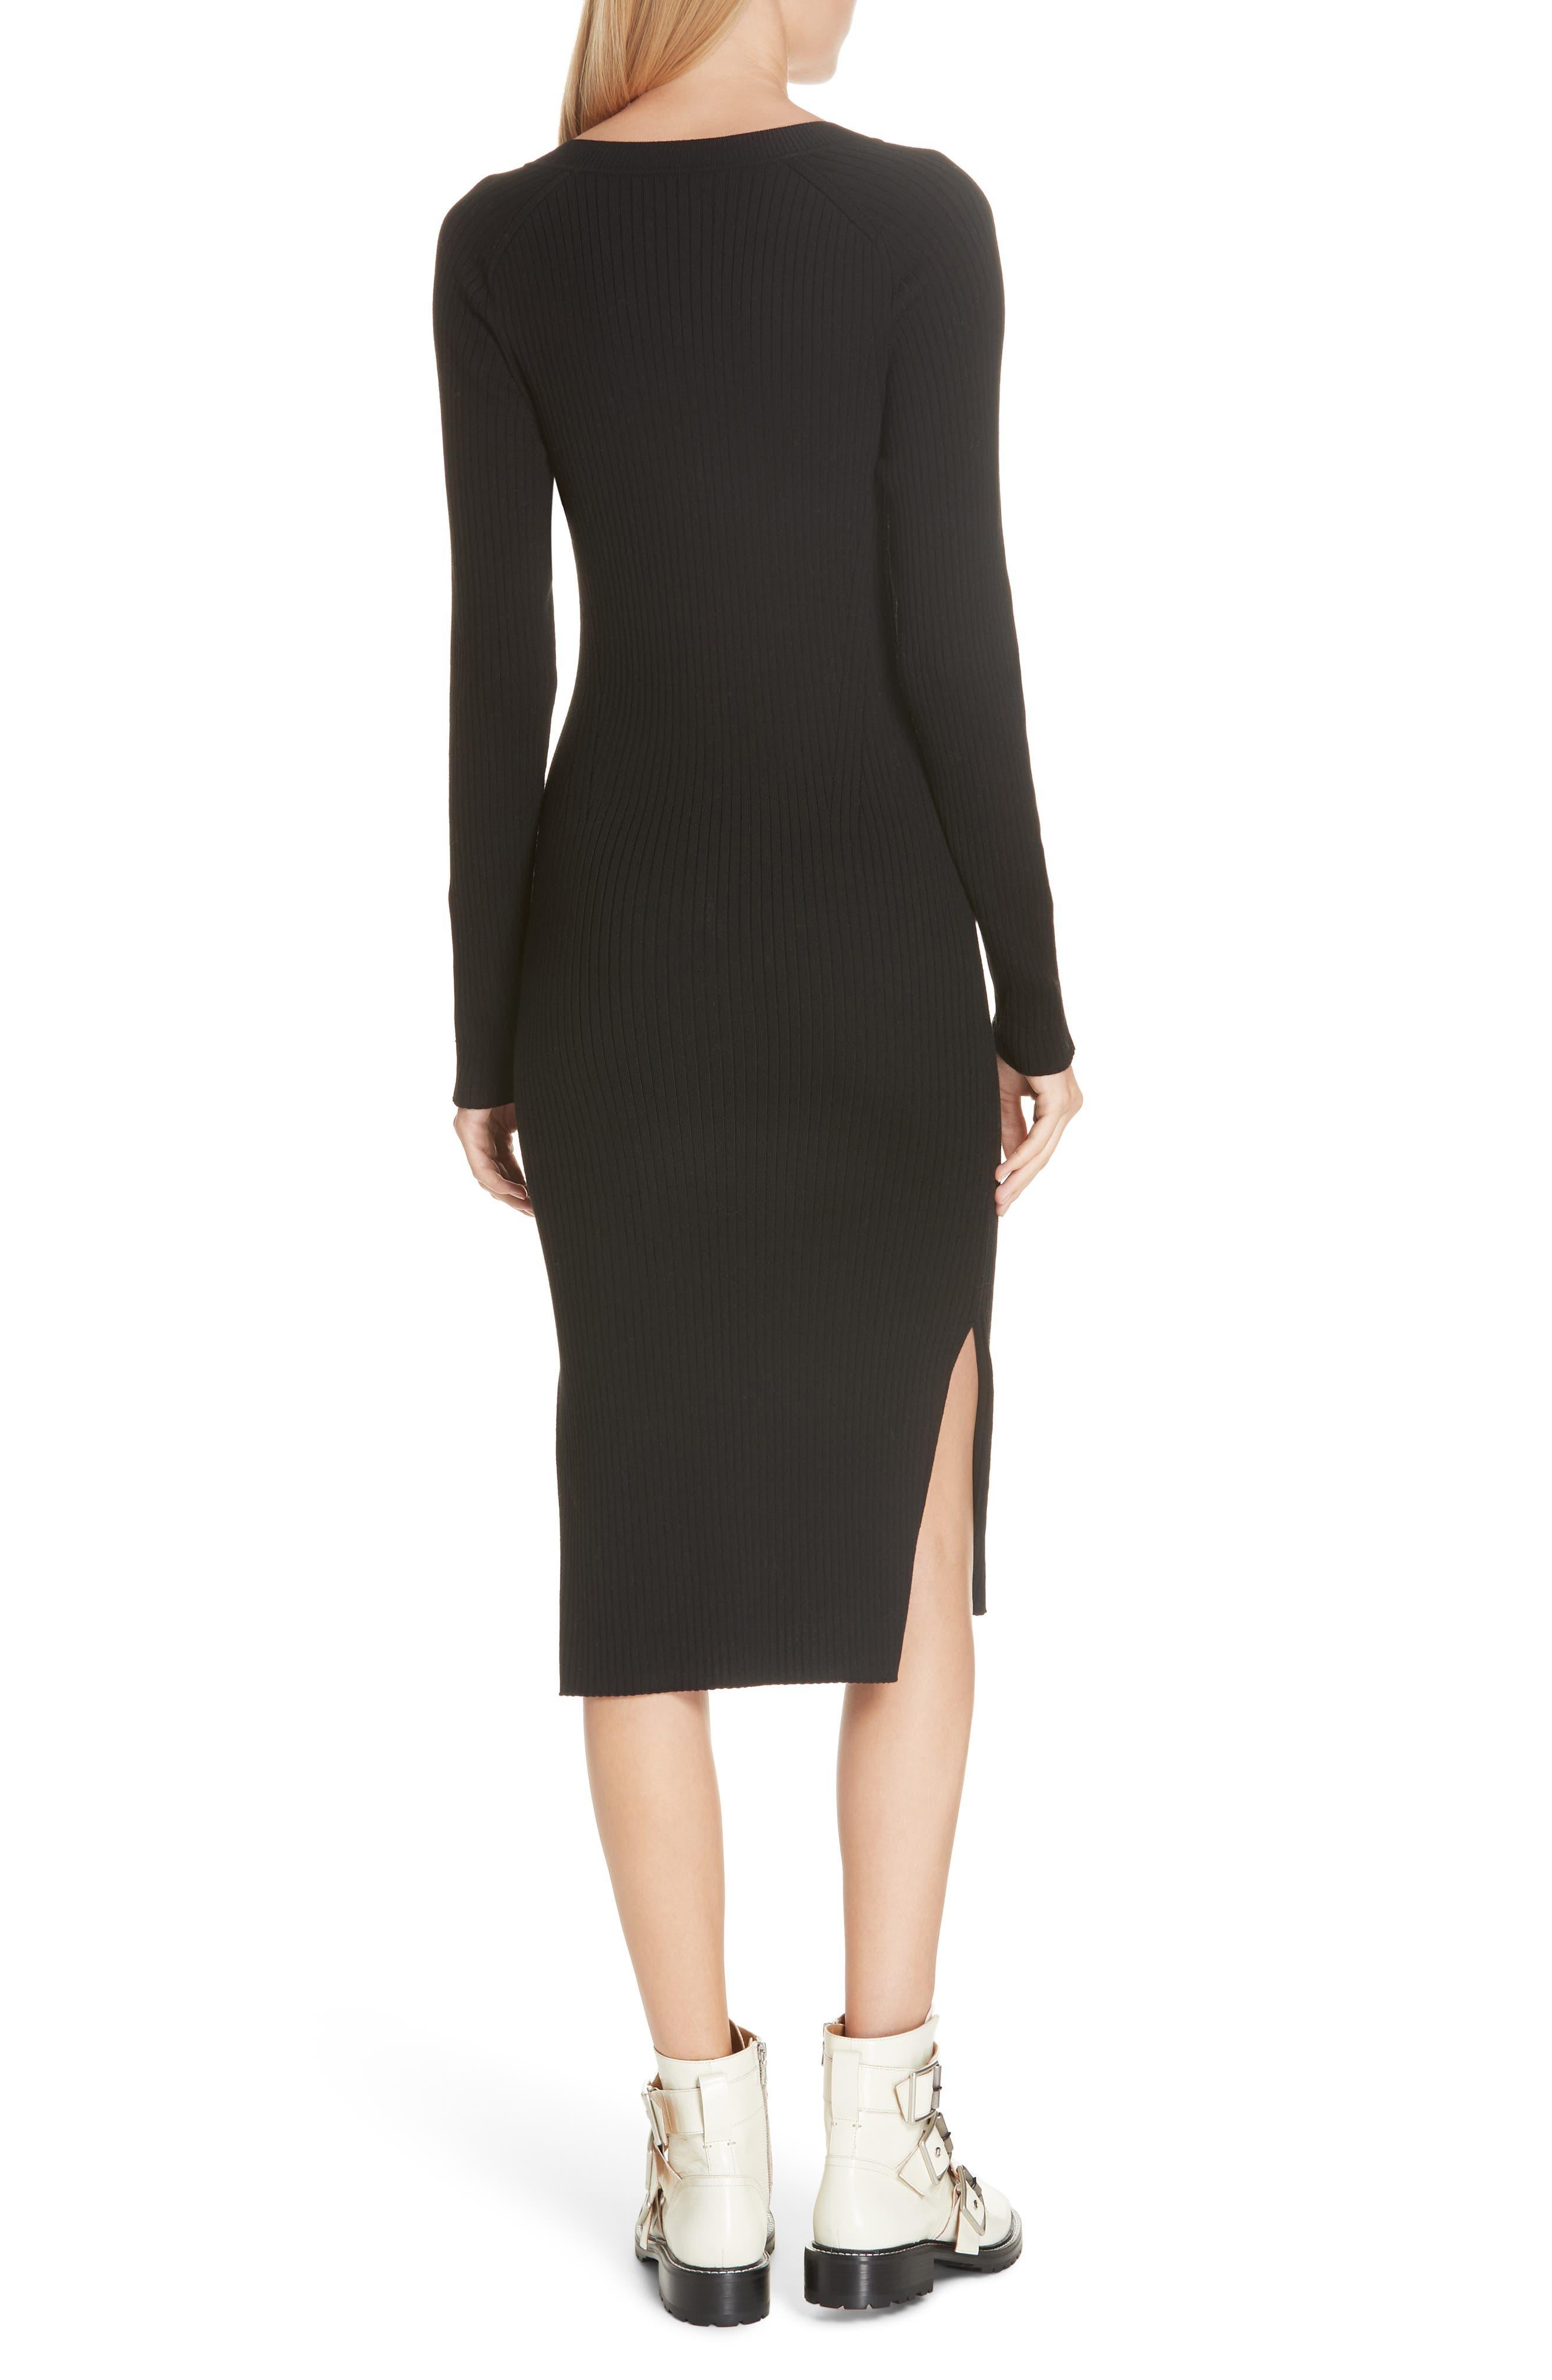 RAG & BONE,                             Brynn Rib Knit Dress,                             Alternate thumbnail 2, color,                             BLACK